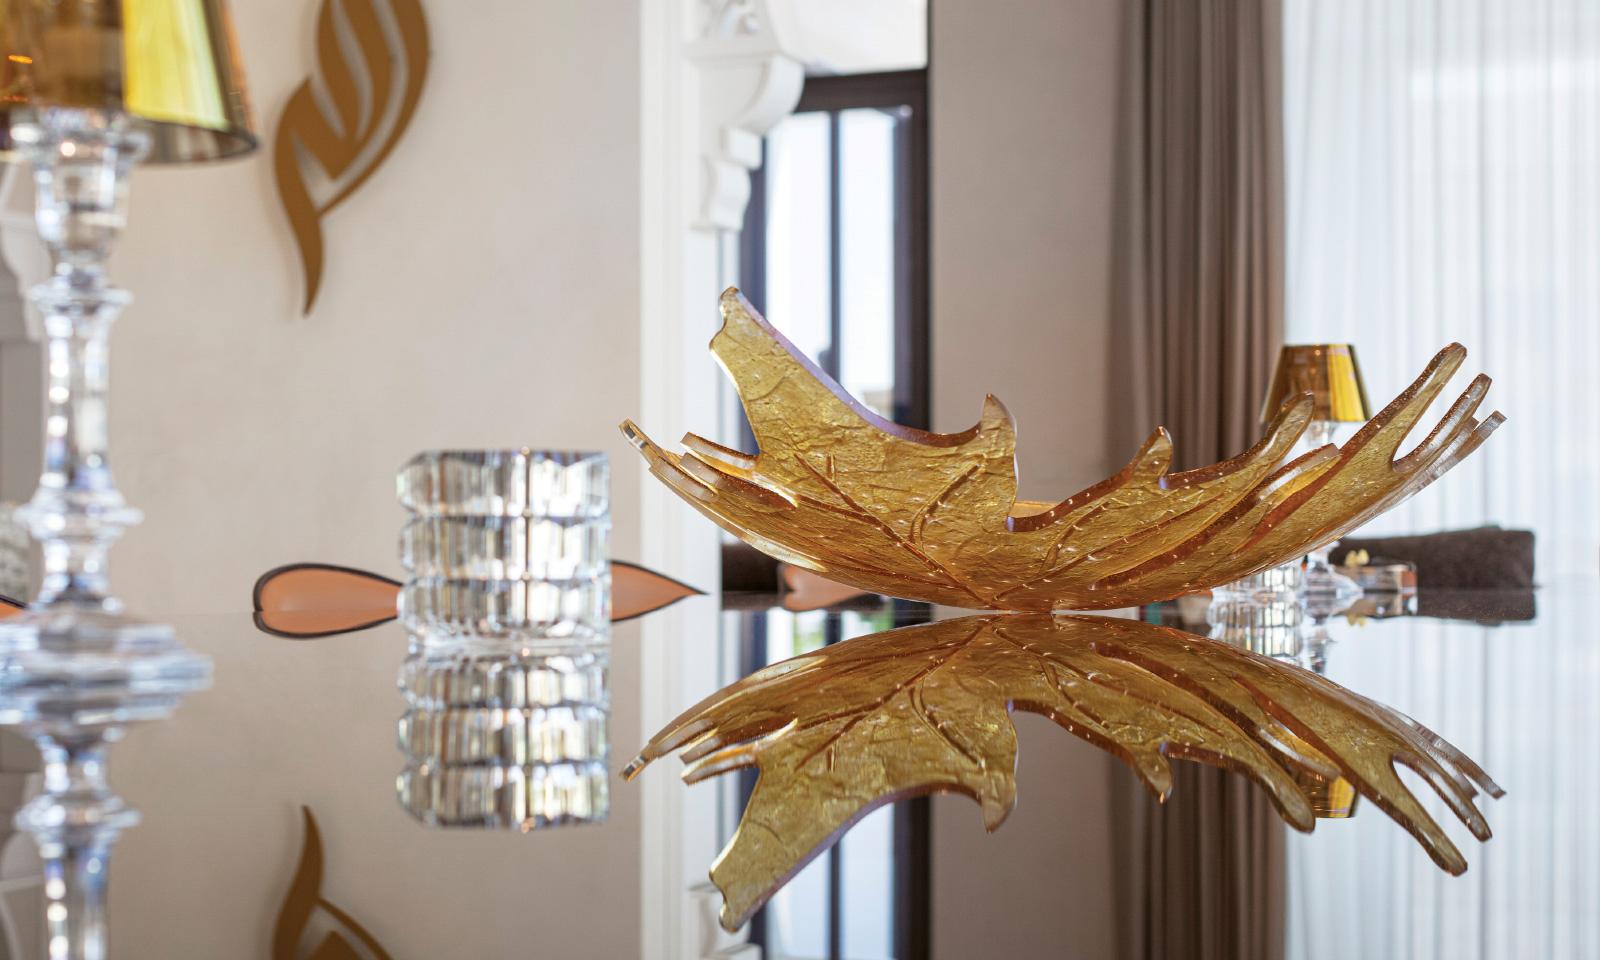 Sans Souci Lighting: Private Residence, Dubai